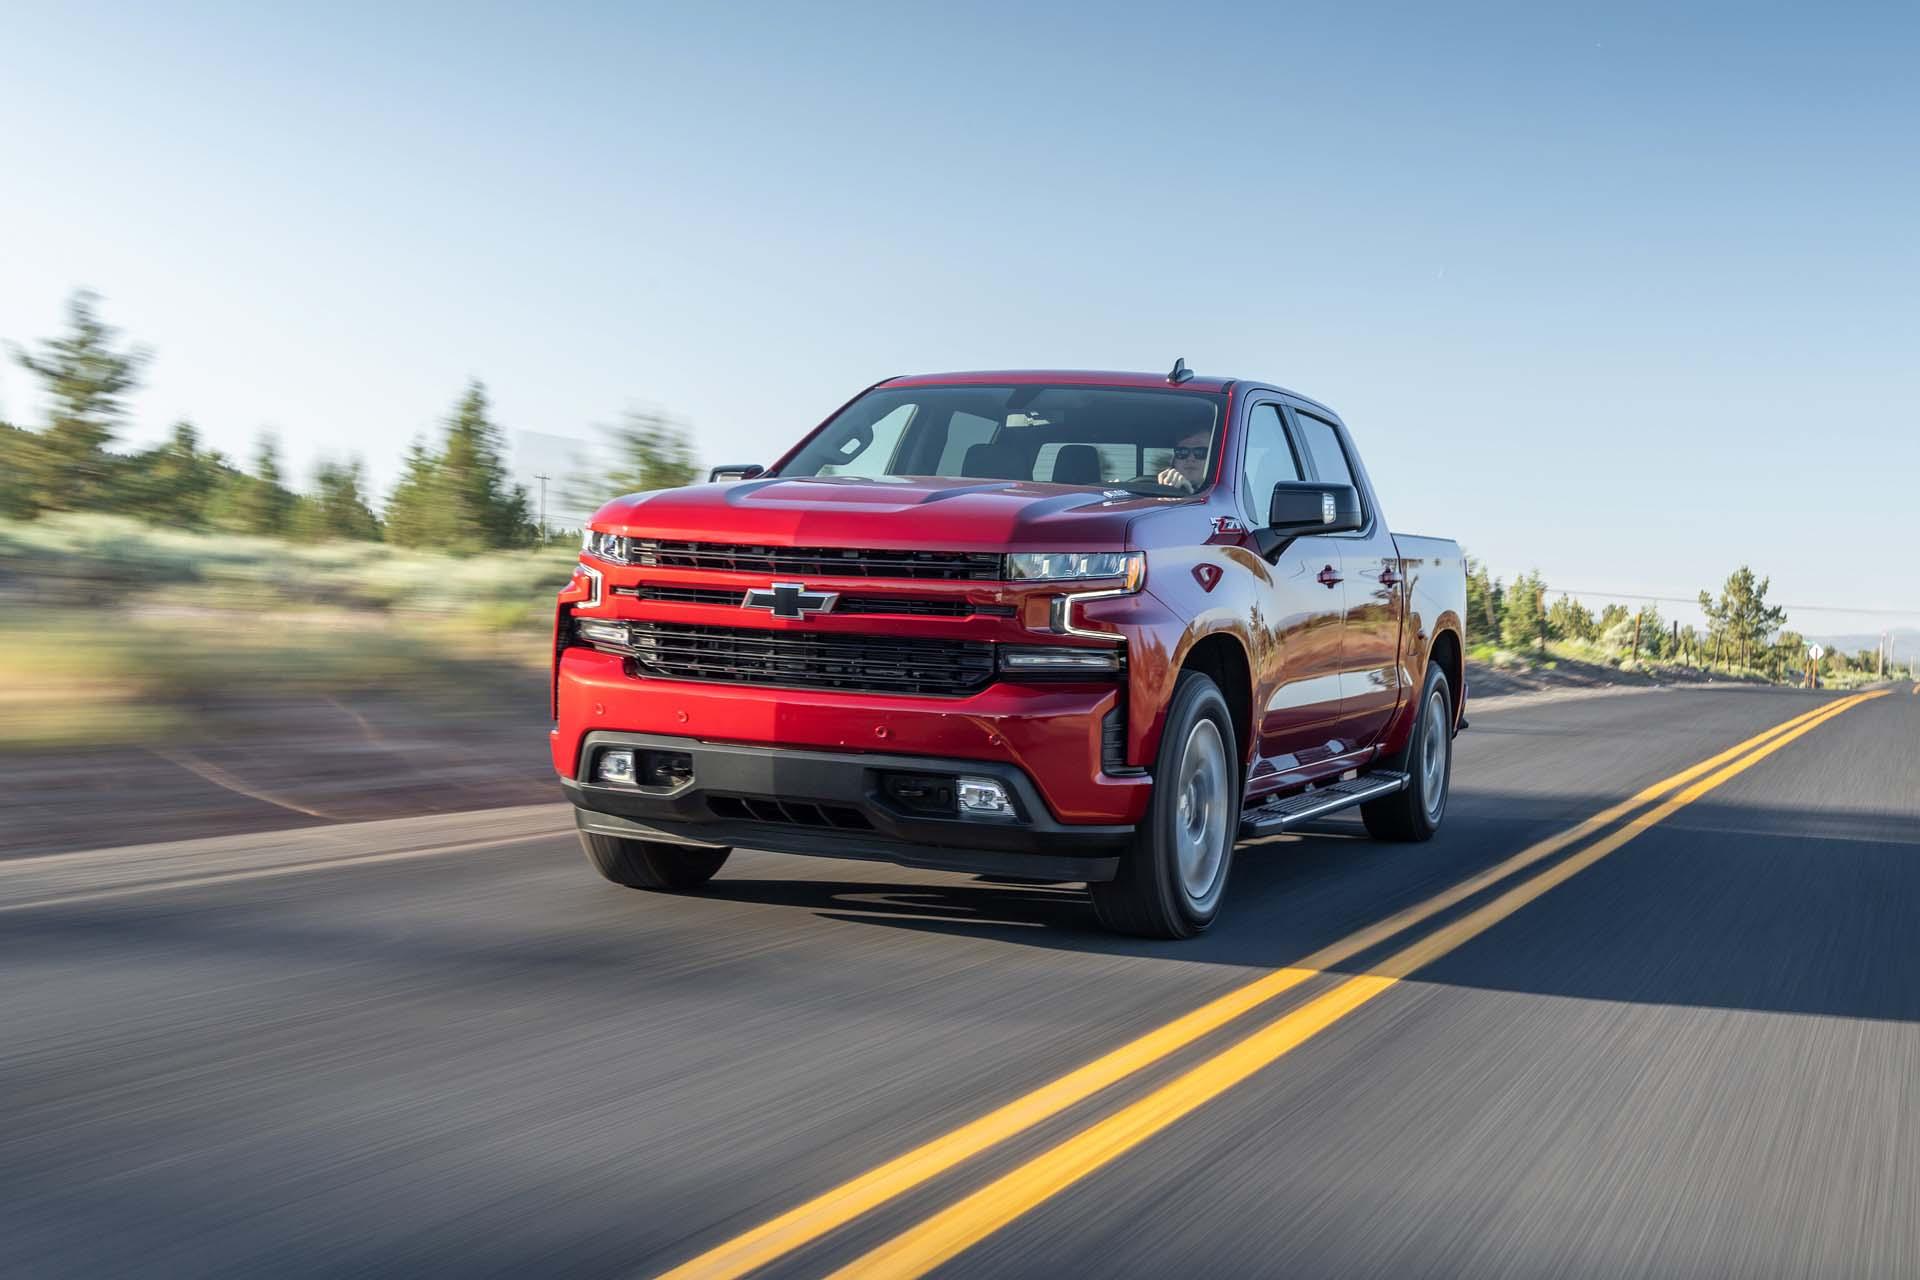 2020 Chevrolet Silverado diesel tops pickup truck mpg race